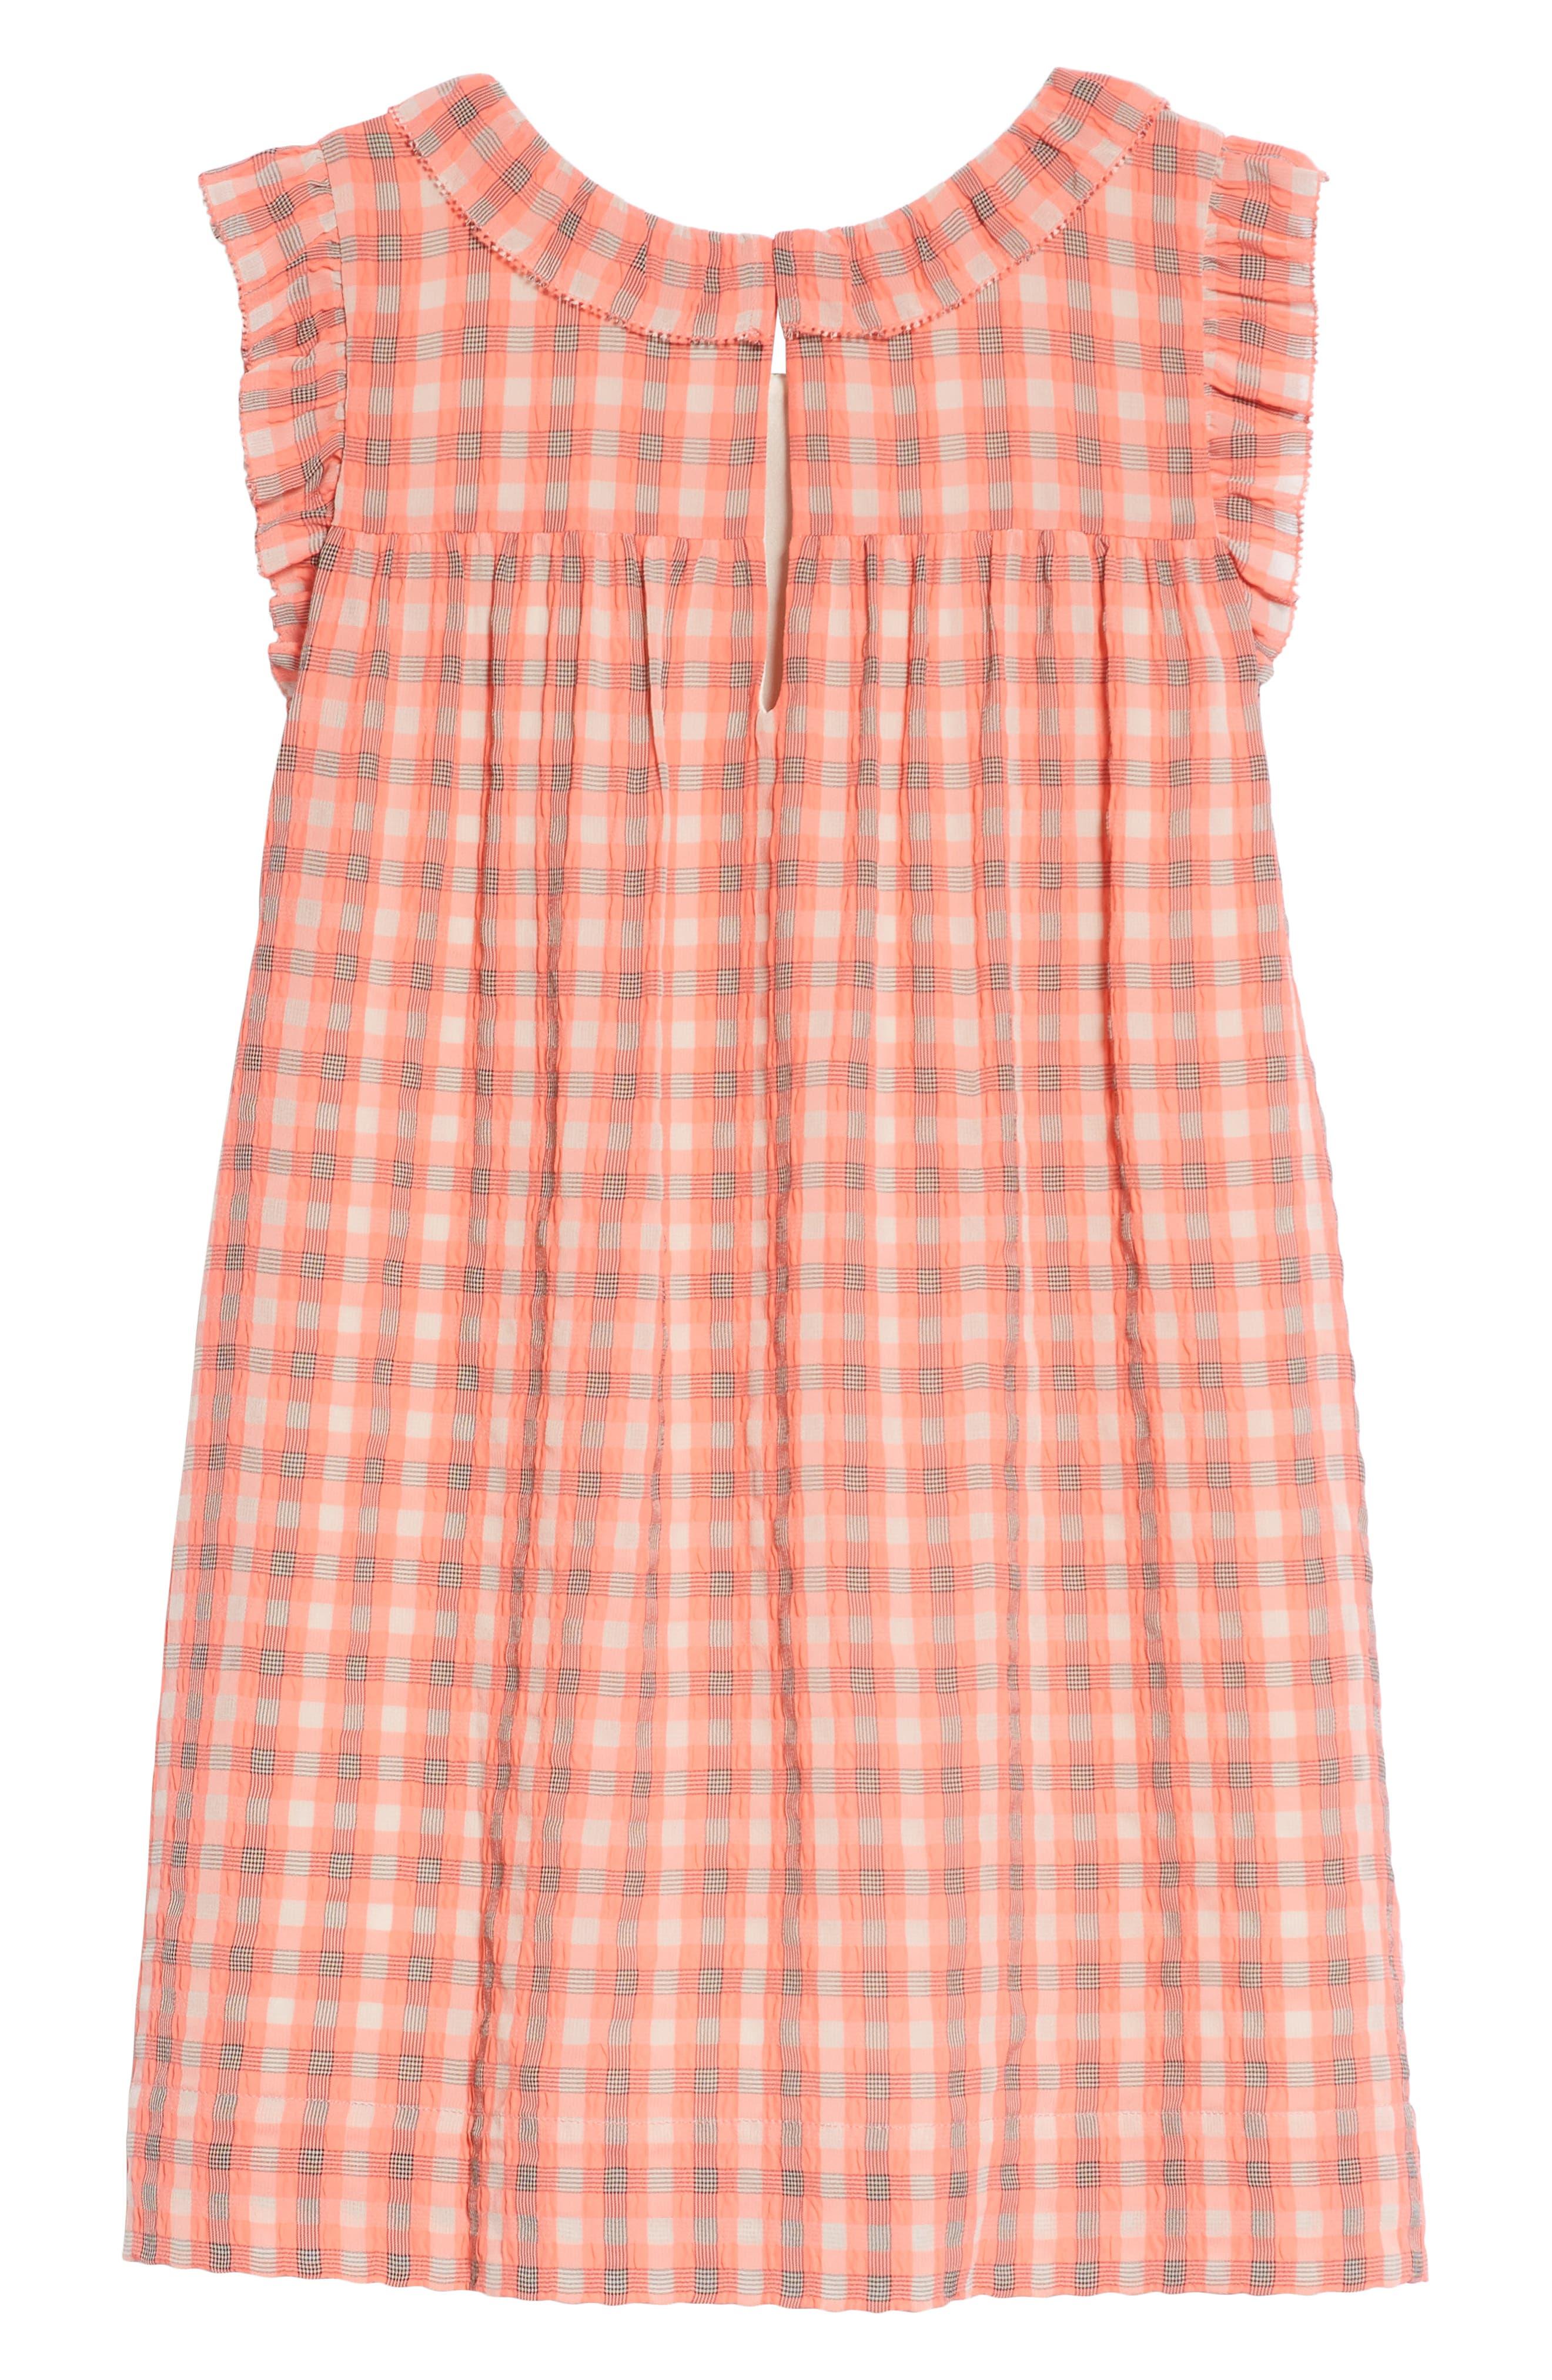 Alternate Image 2  - Burberry Magnoly Check Ruffle Dress (Little Girls & Big Girls)